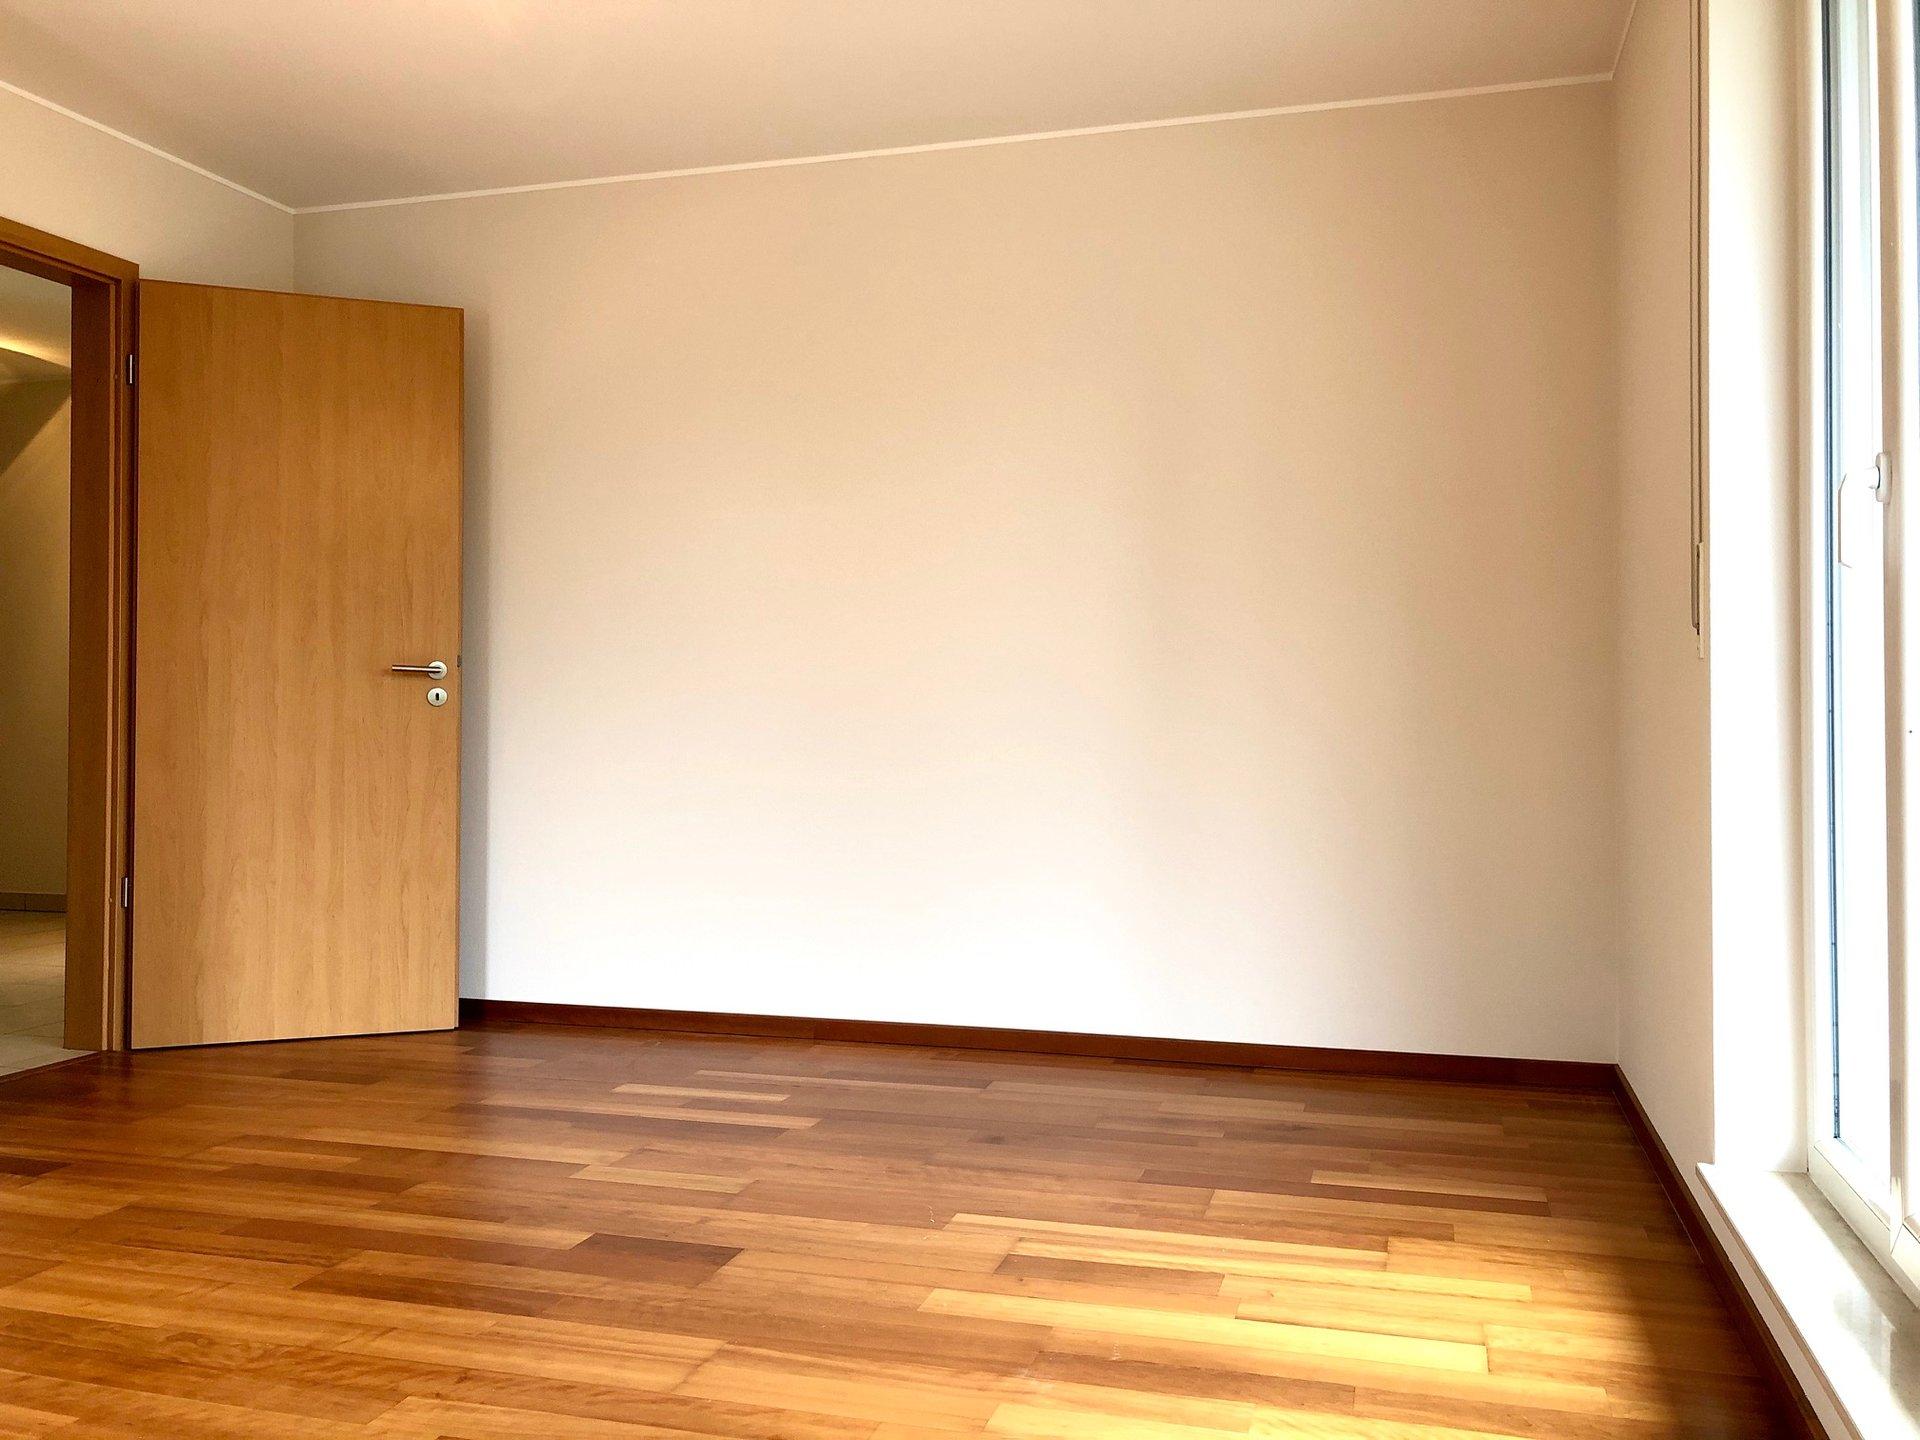 Appartement 2 chambres à Mamer